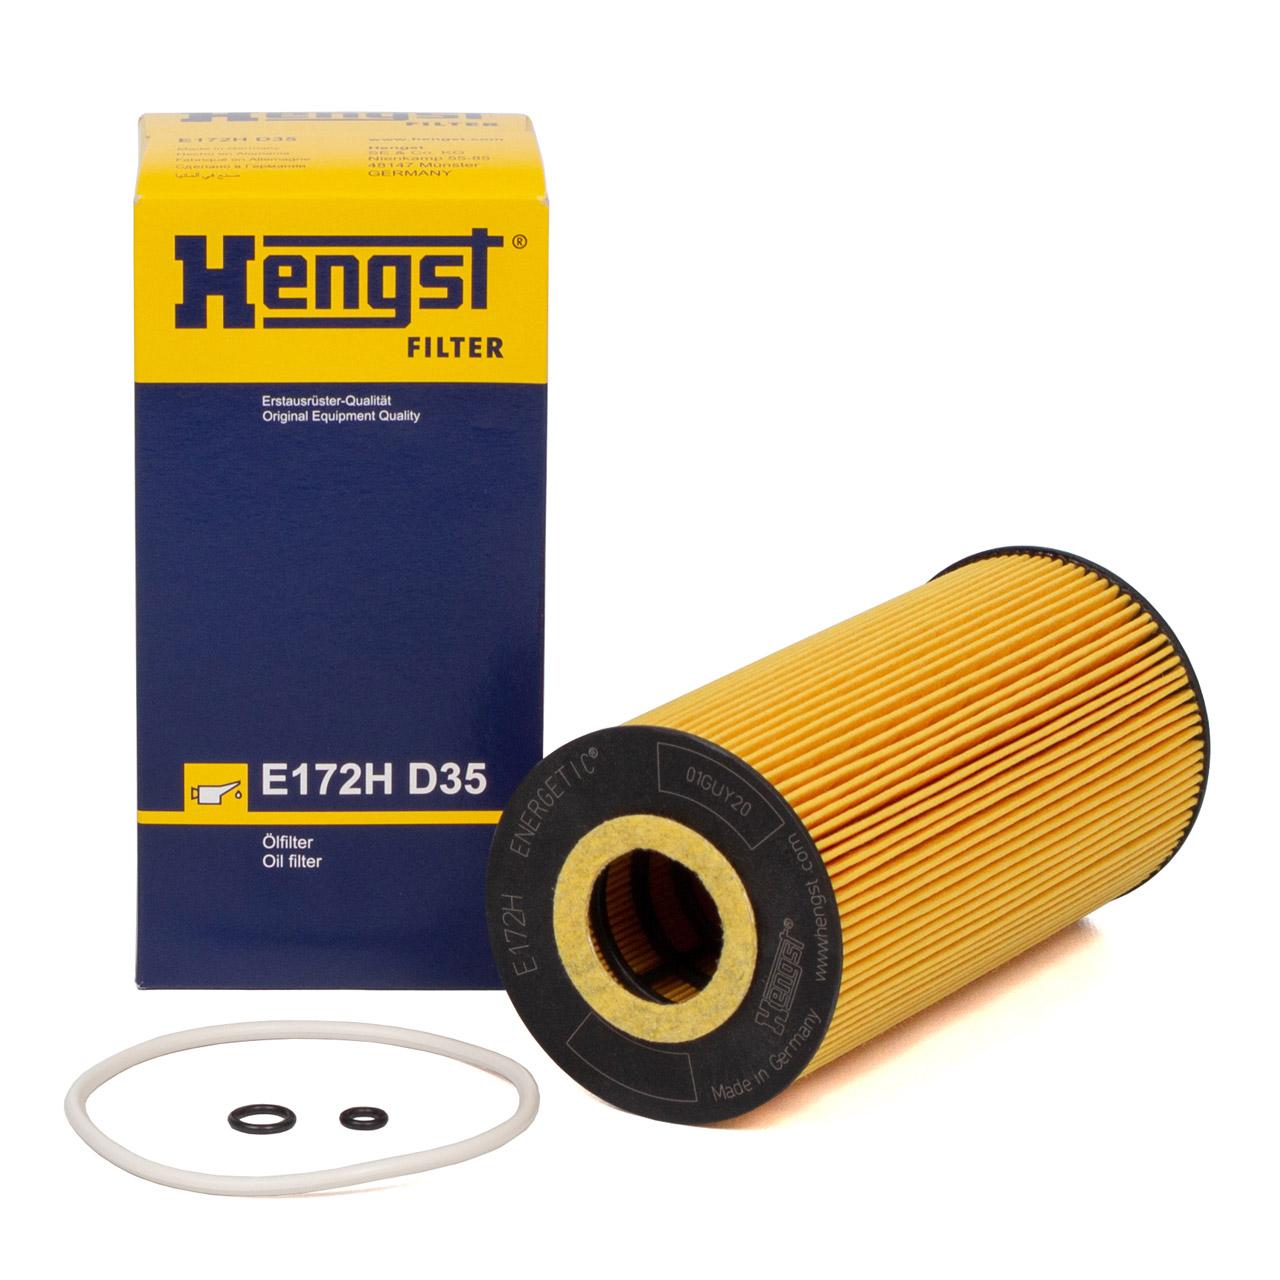 HENGST E172HD35 Ölfilter MERCEDES-BENZ OM601 OM602 OM603 OM604 OM605